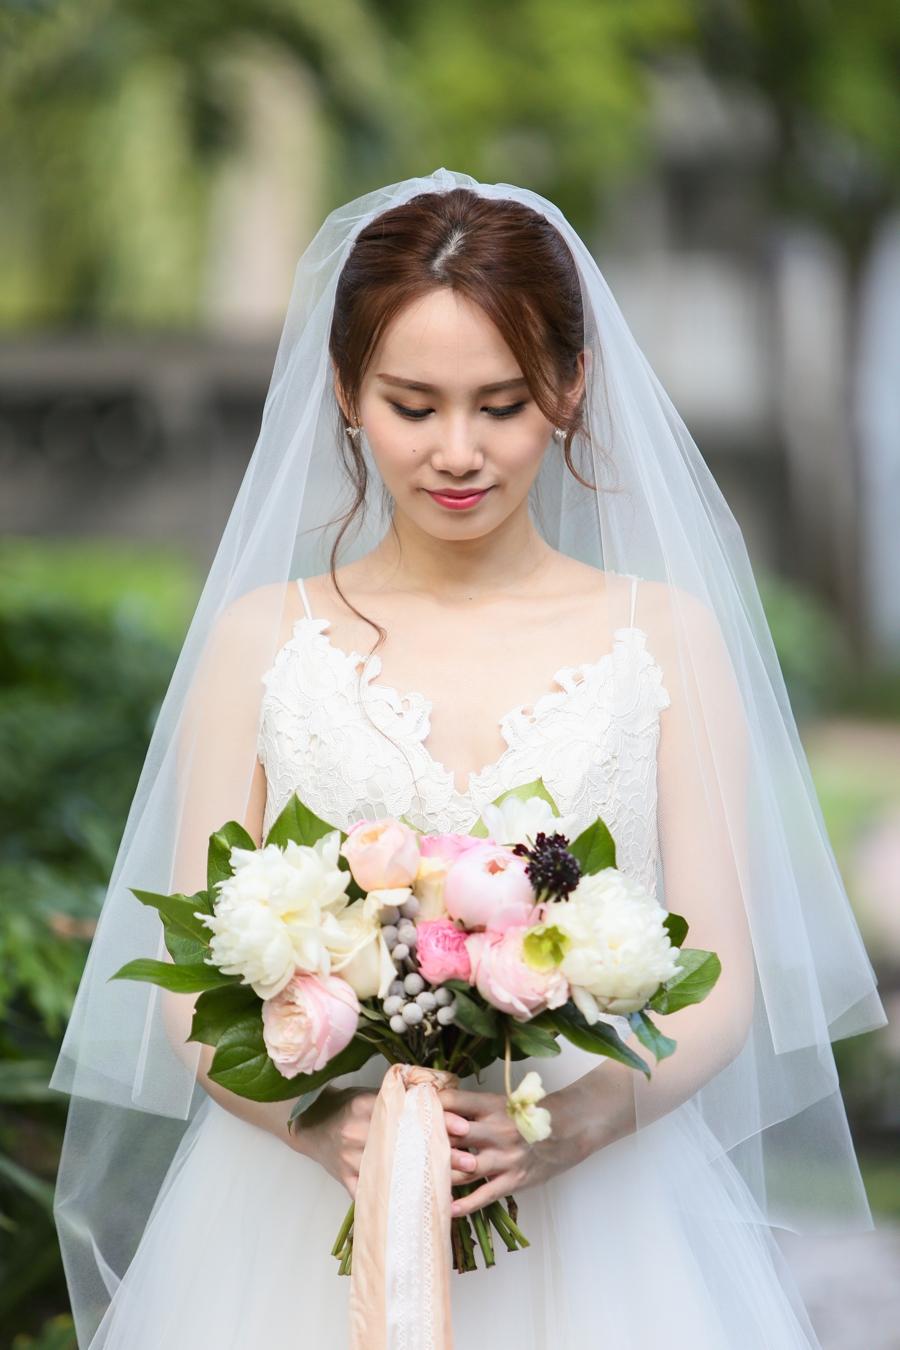 Casa_Ybel_Wedding_ Sanibel_Wedding_Florist_Designer_Planner_1863.jpg